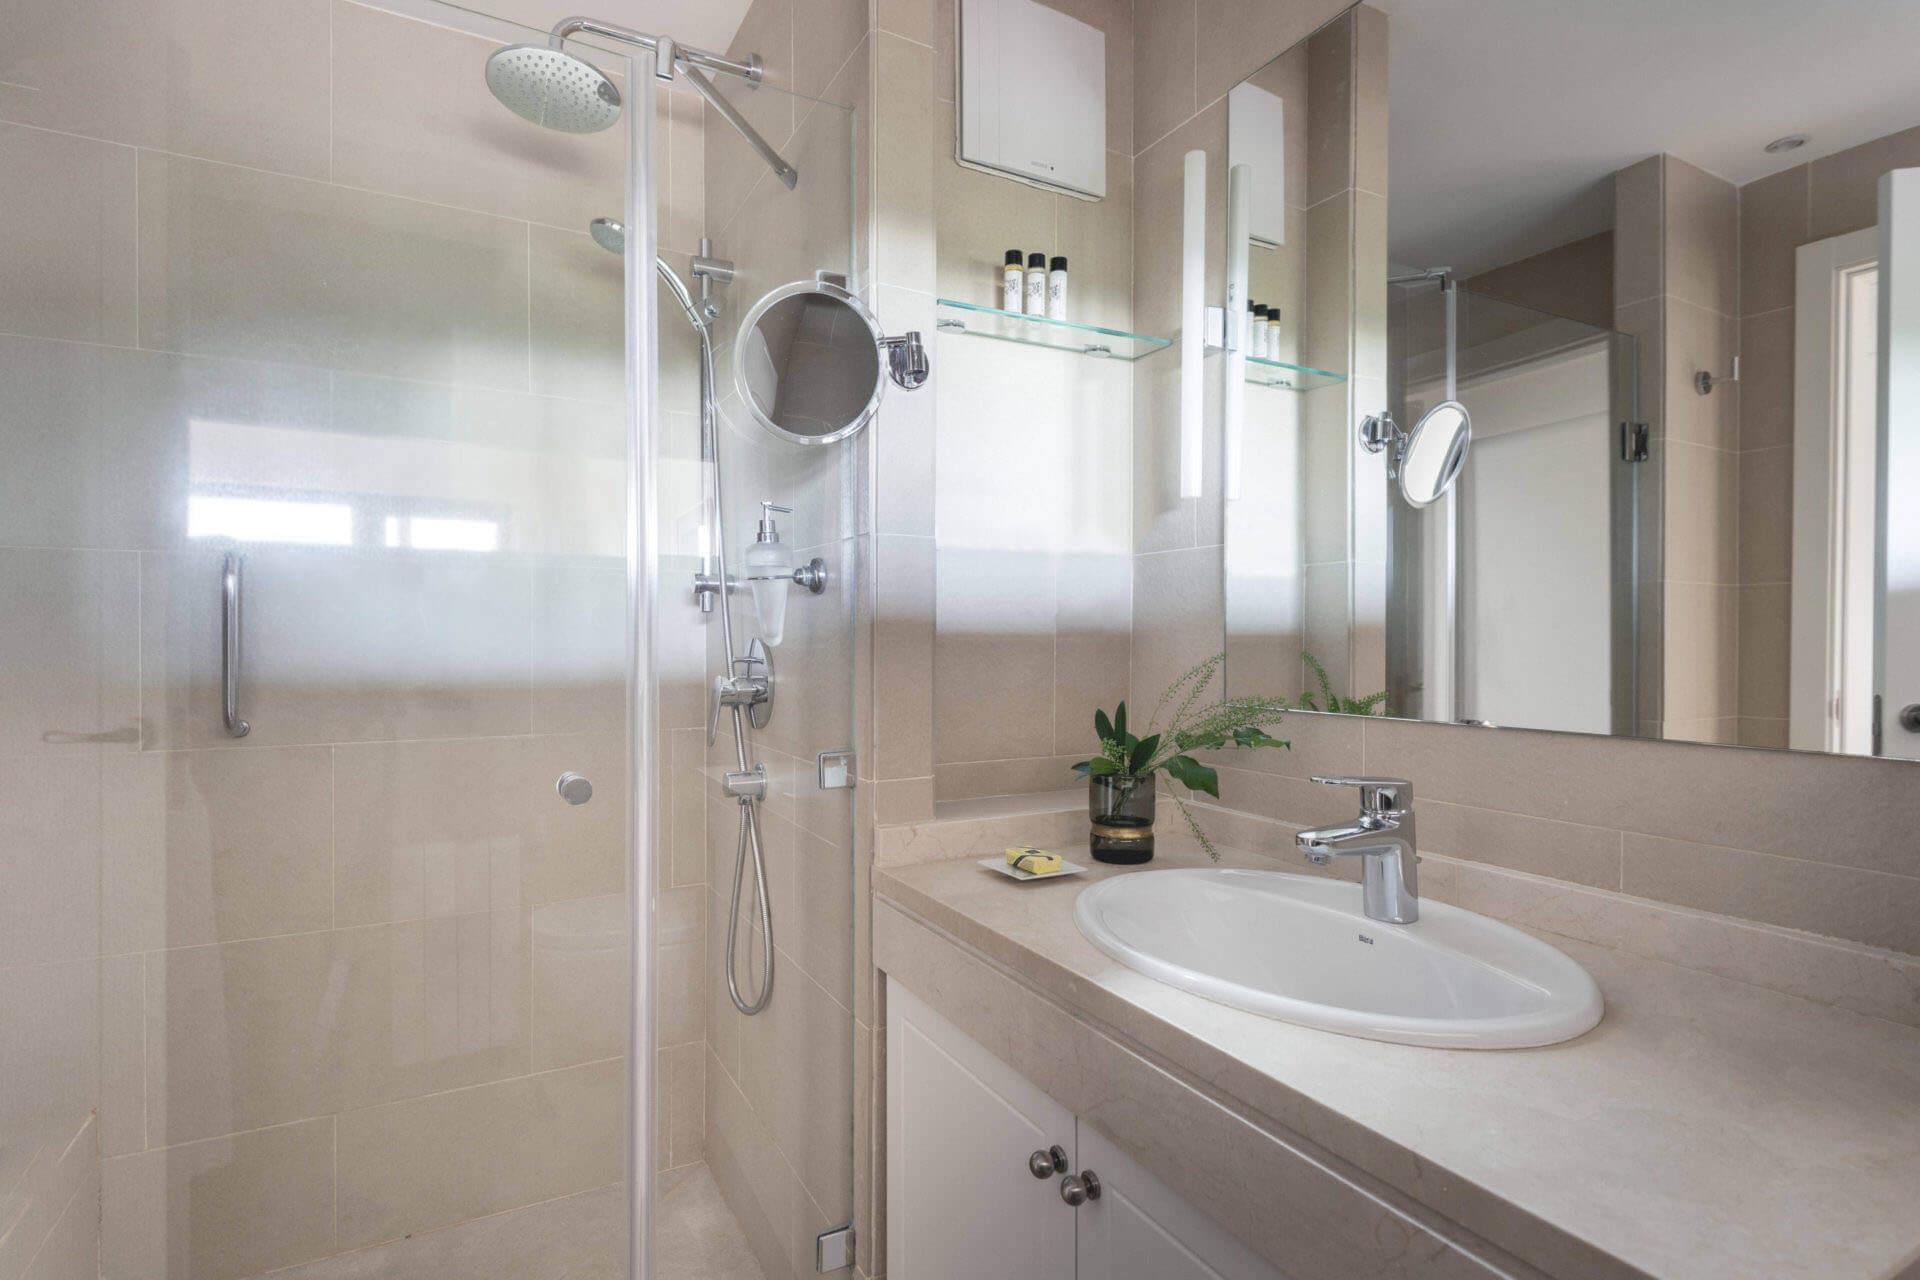 Buchinger Wilhelmi, Fasten, Heilfasten, Fasting, Health, Integrative Medicine, Comfort Room Bathroom, Marbella, Andalusia,